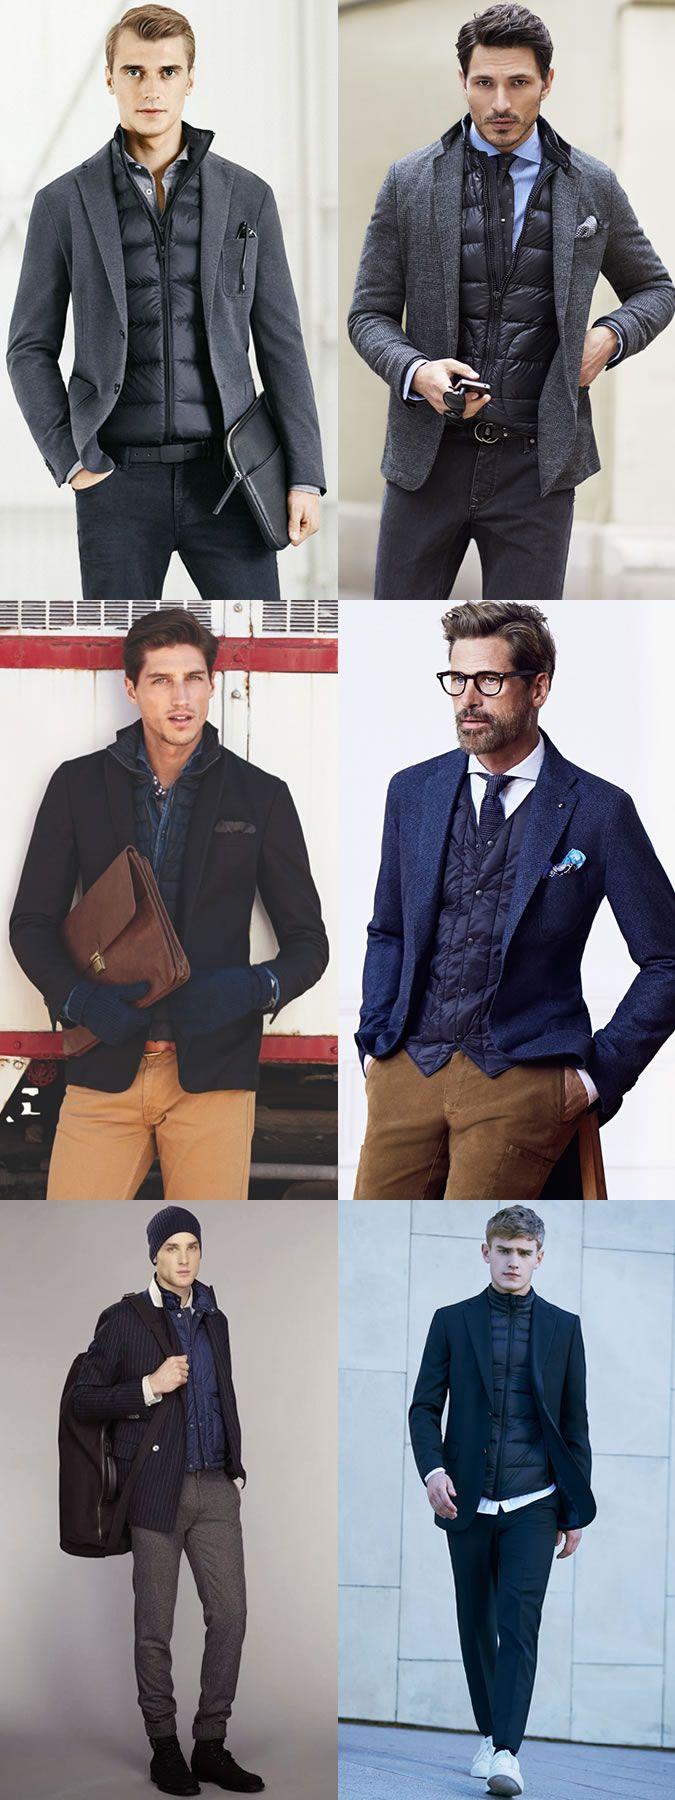 business casual men winter photo - 1